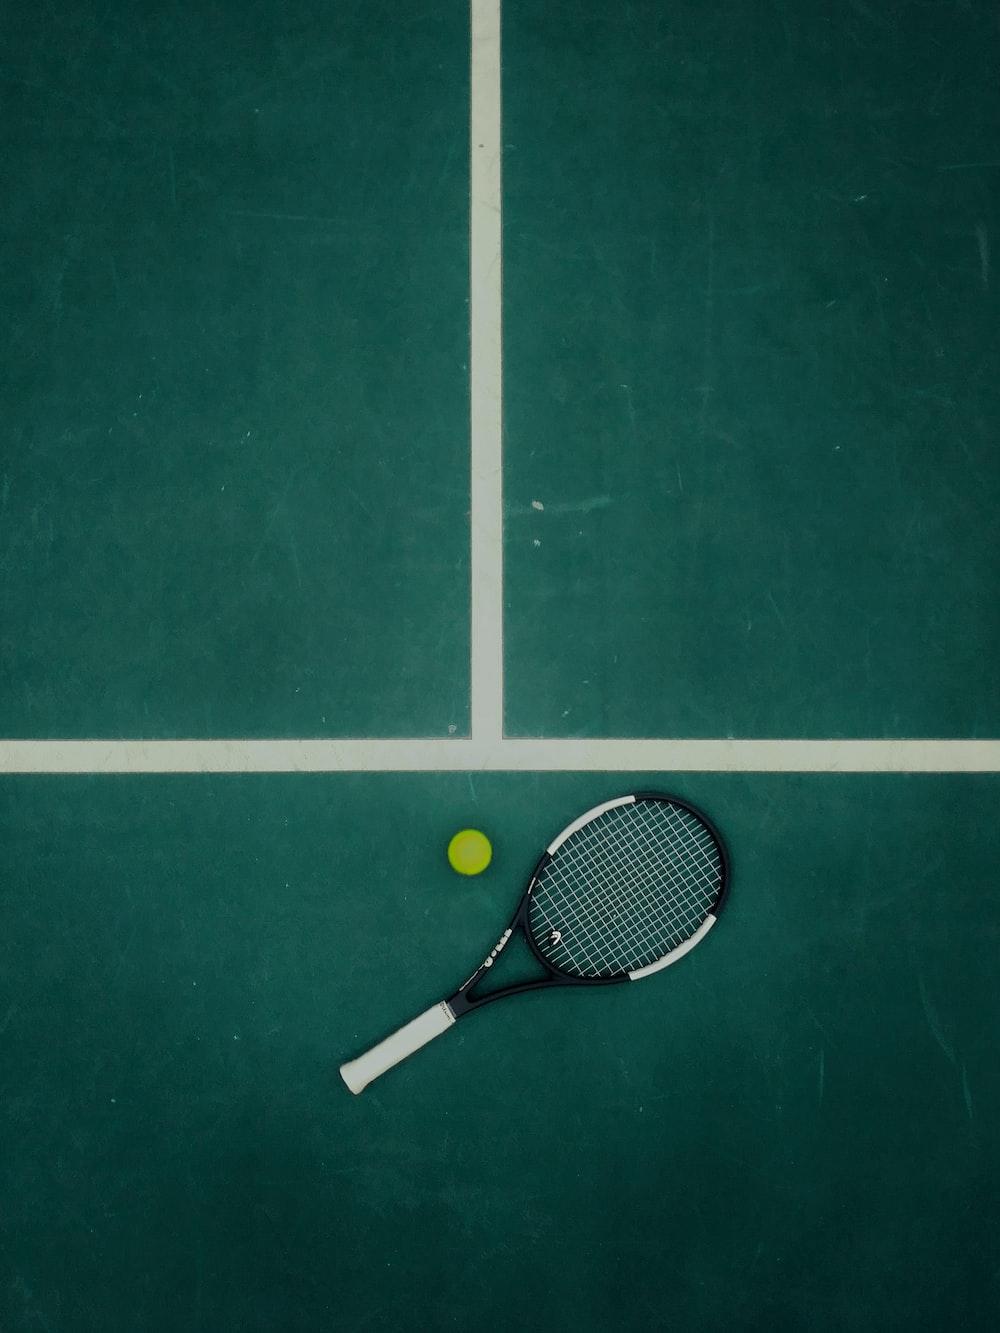 black and white tennis racket beside ball